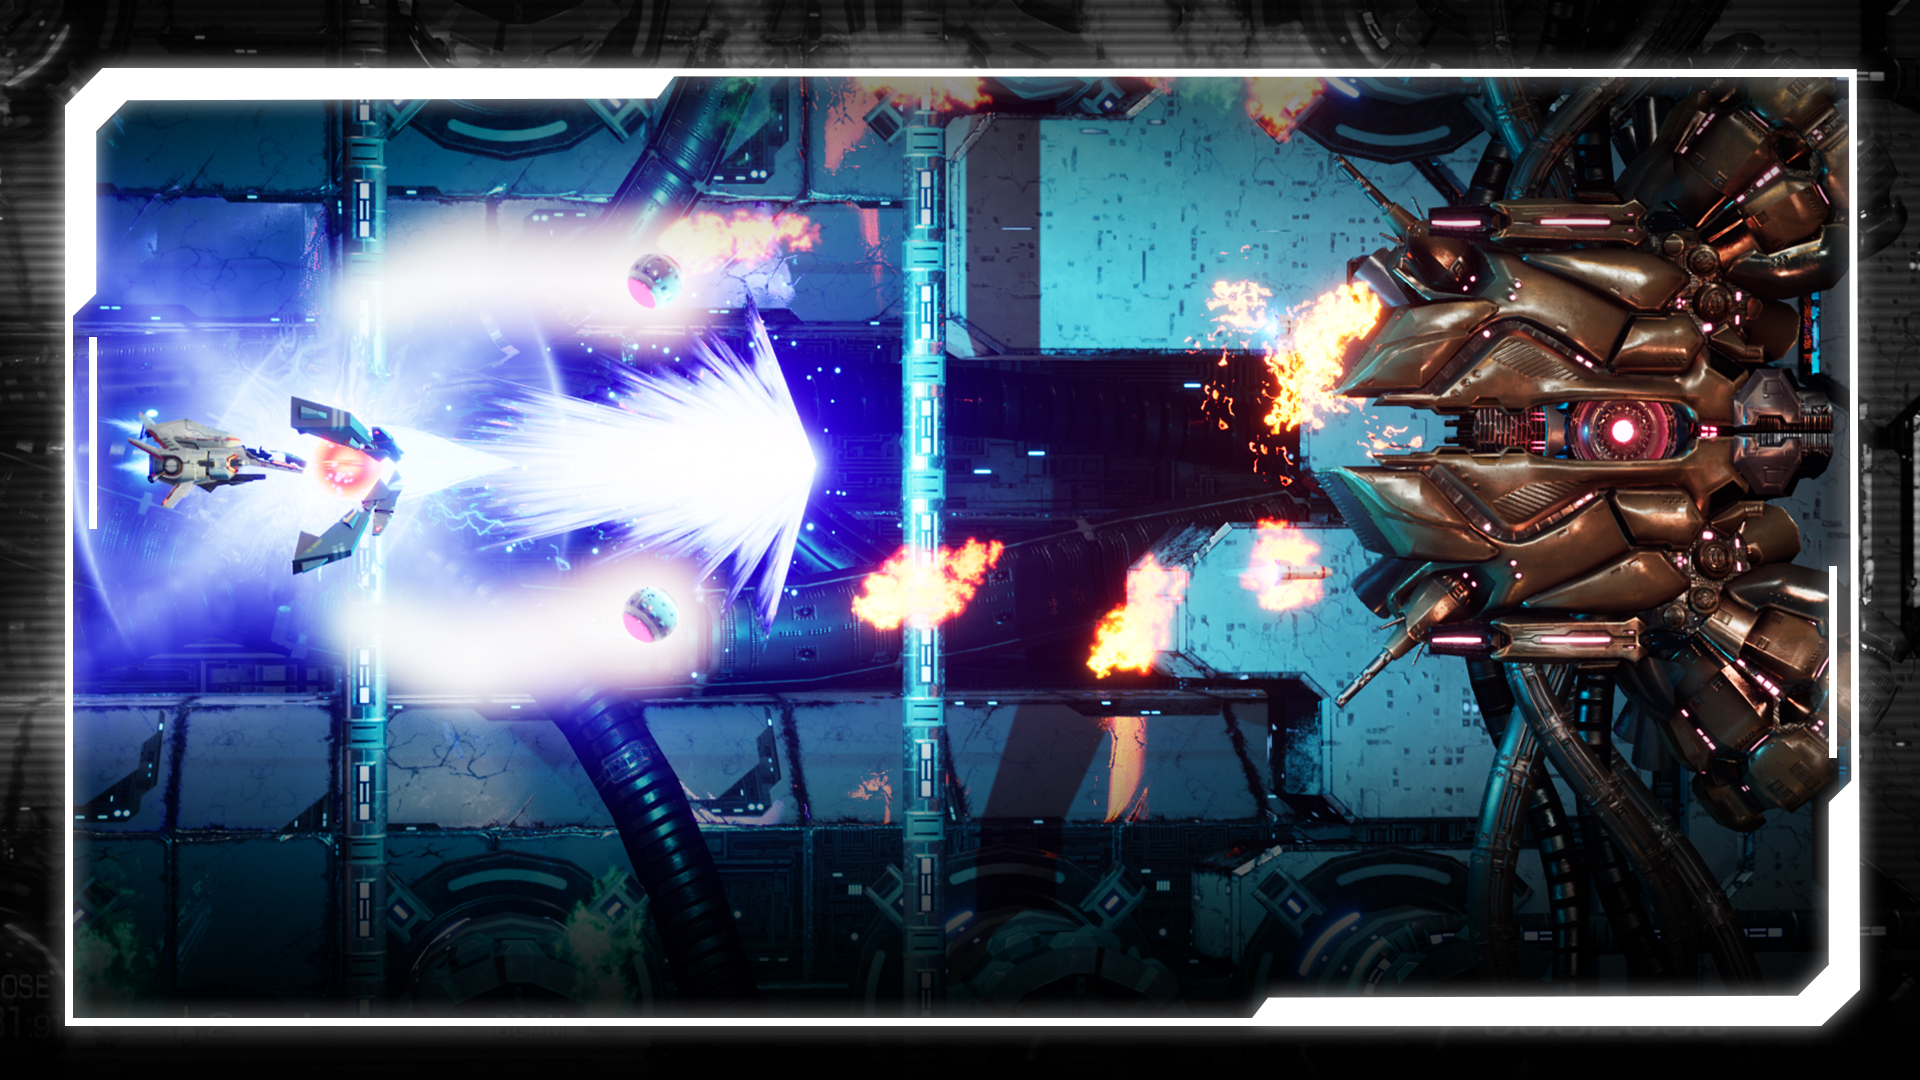 R-Type Final 2: DLC Set 3